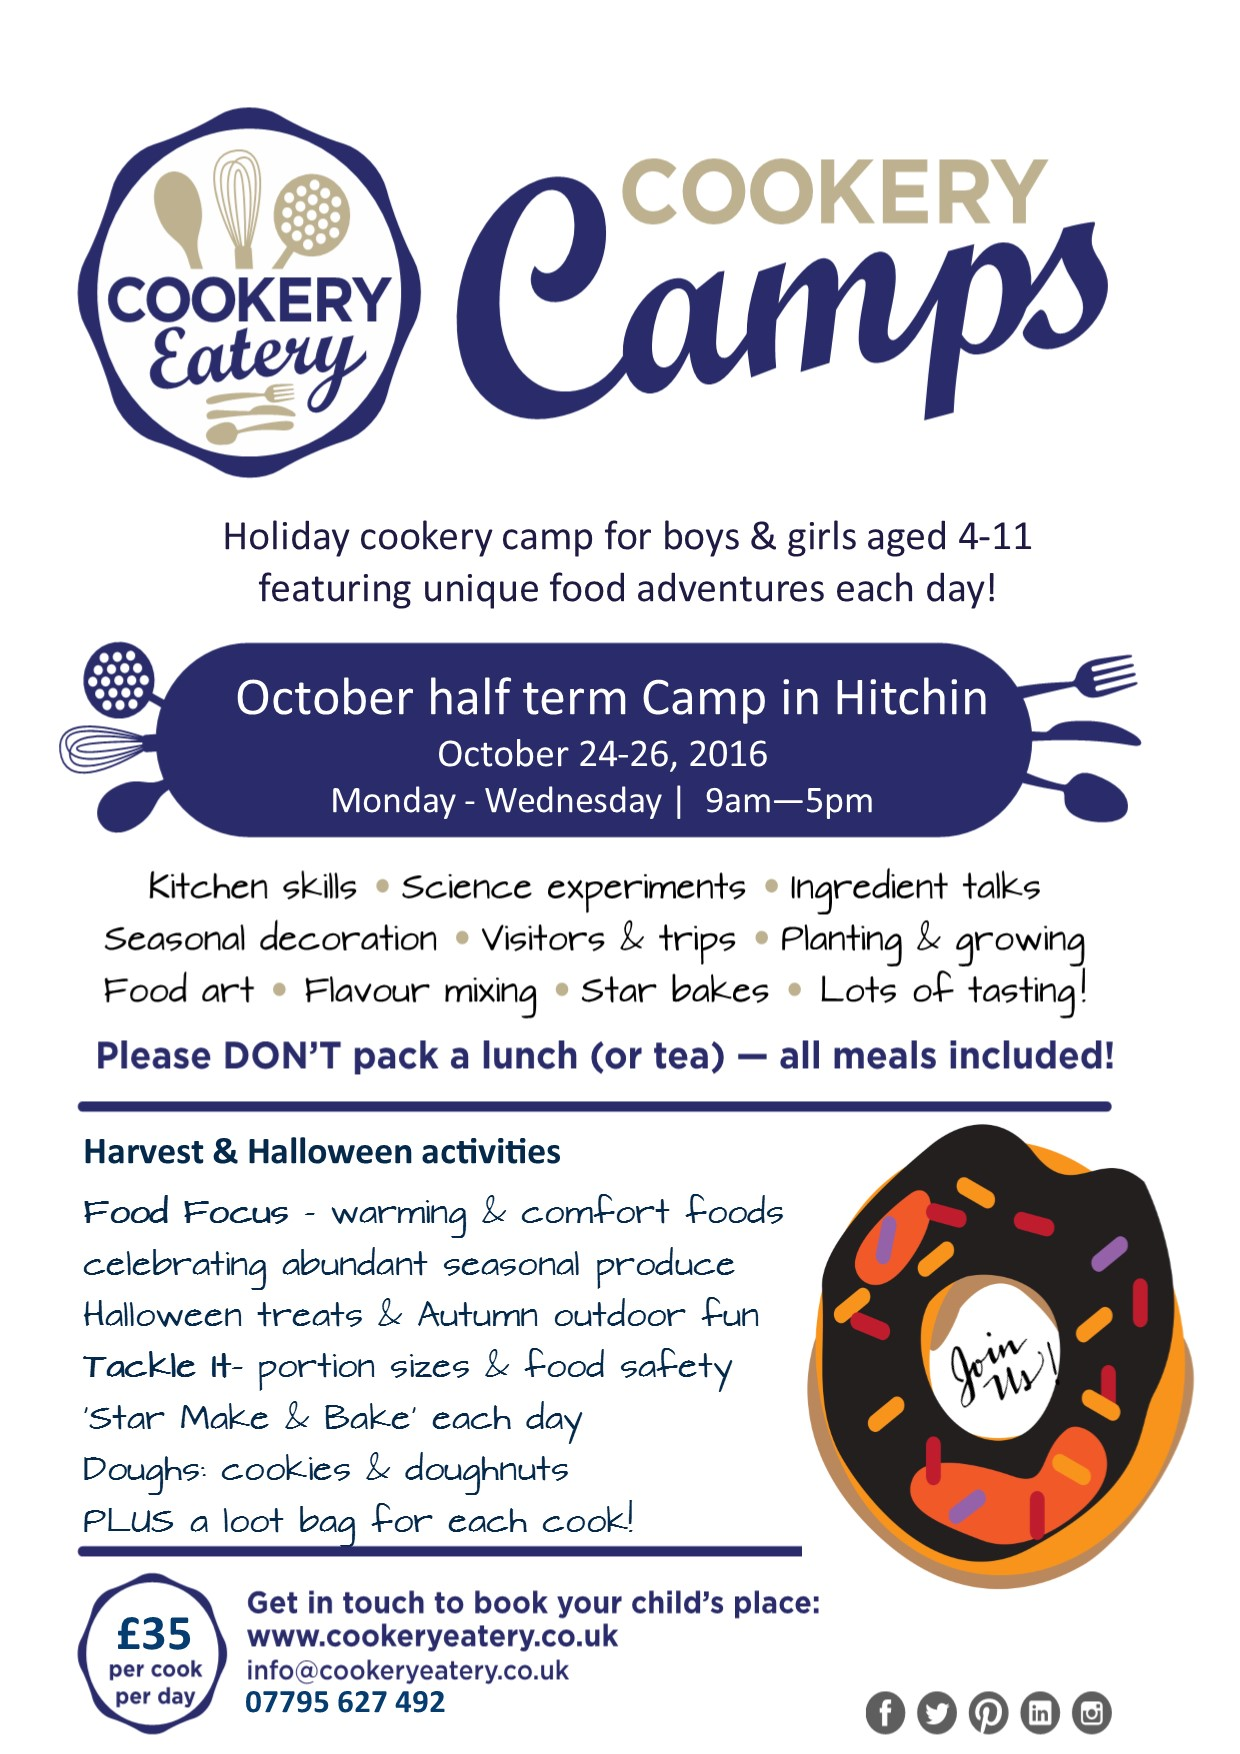 Cookery Camp.October half term 2016.Hitchin.FLYER.jpg